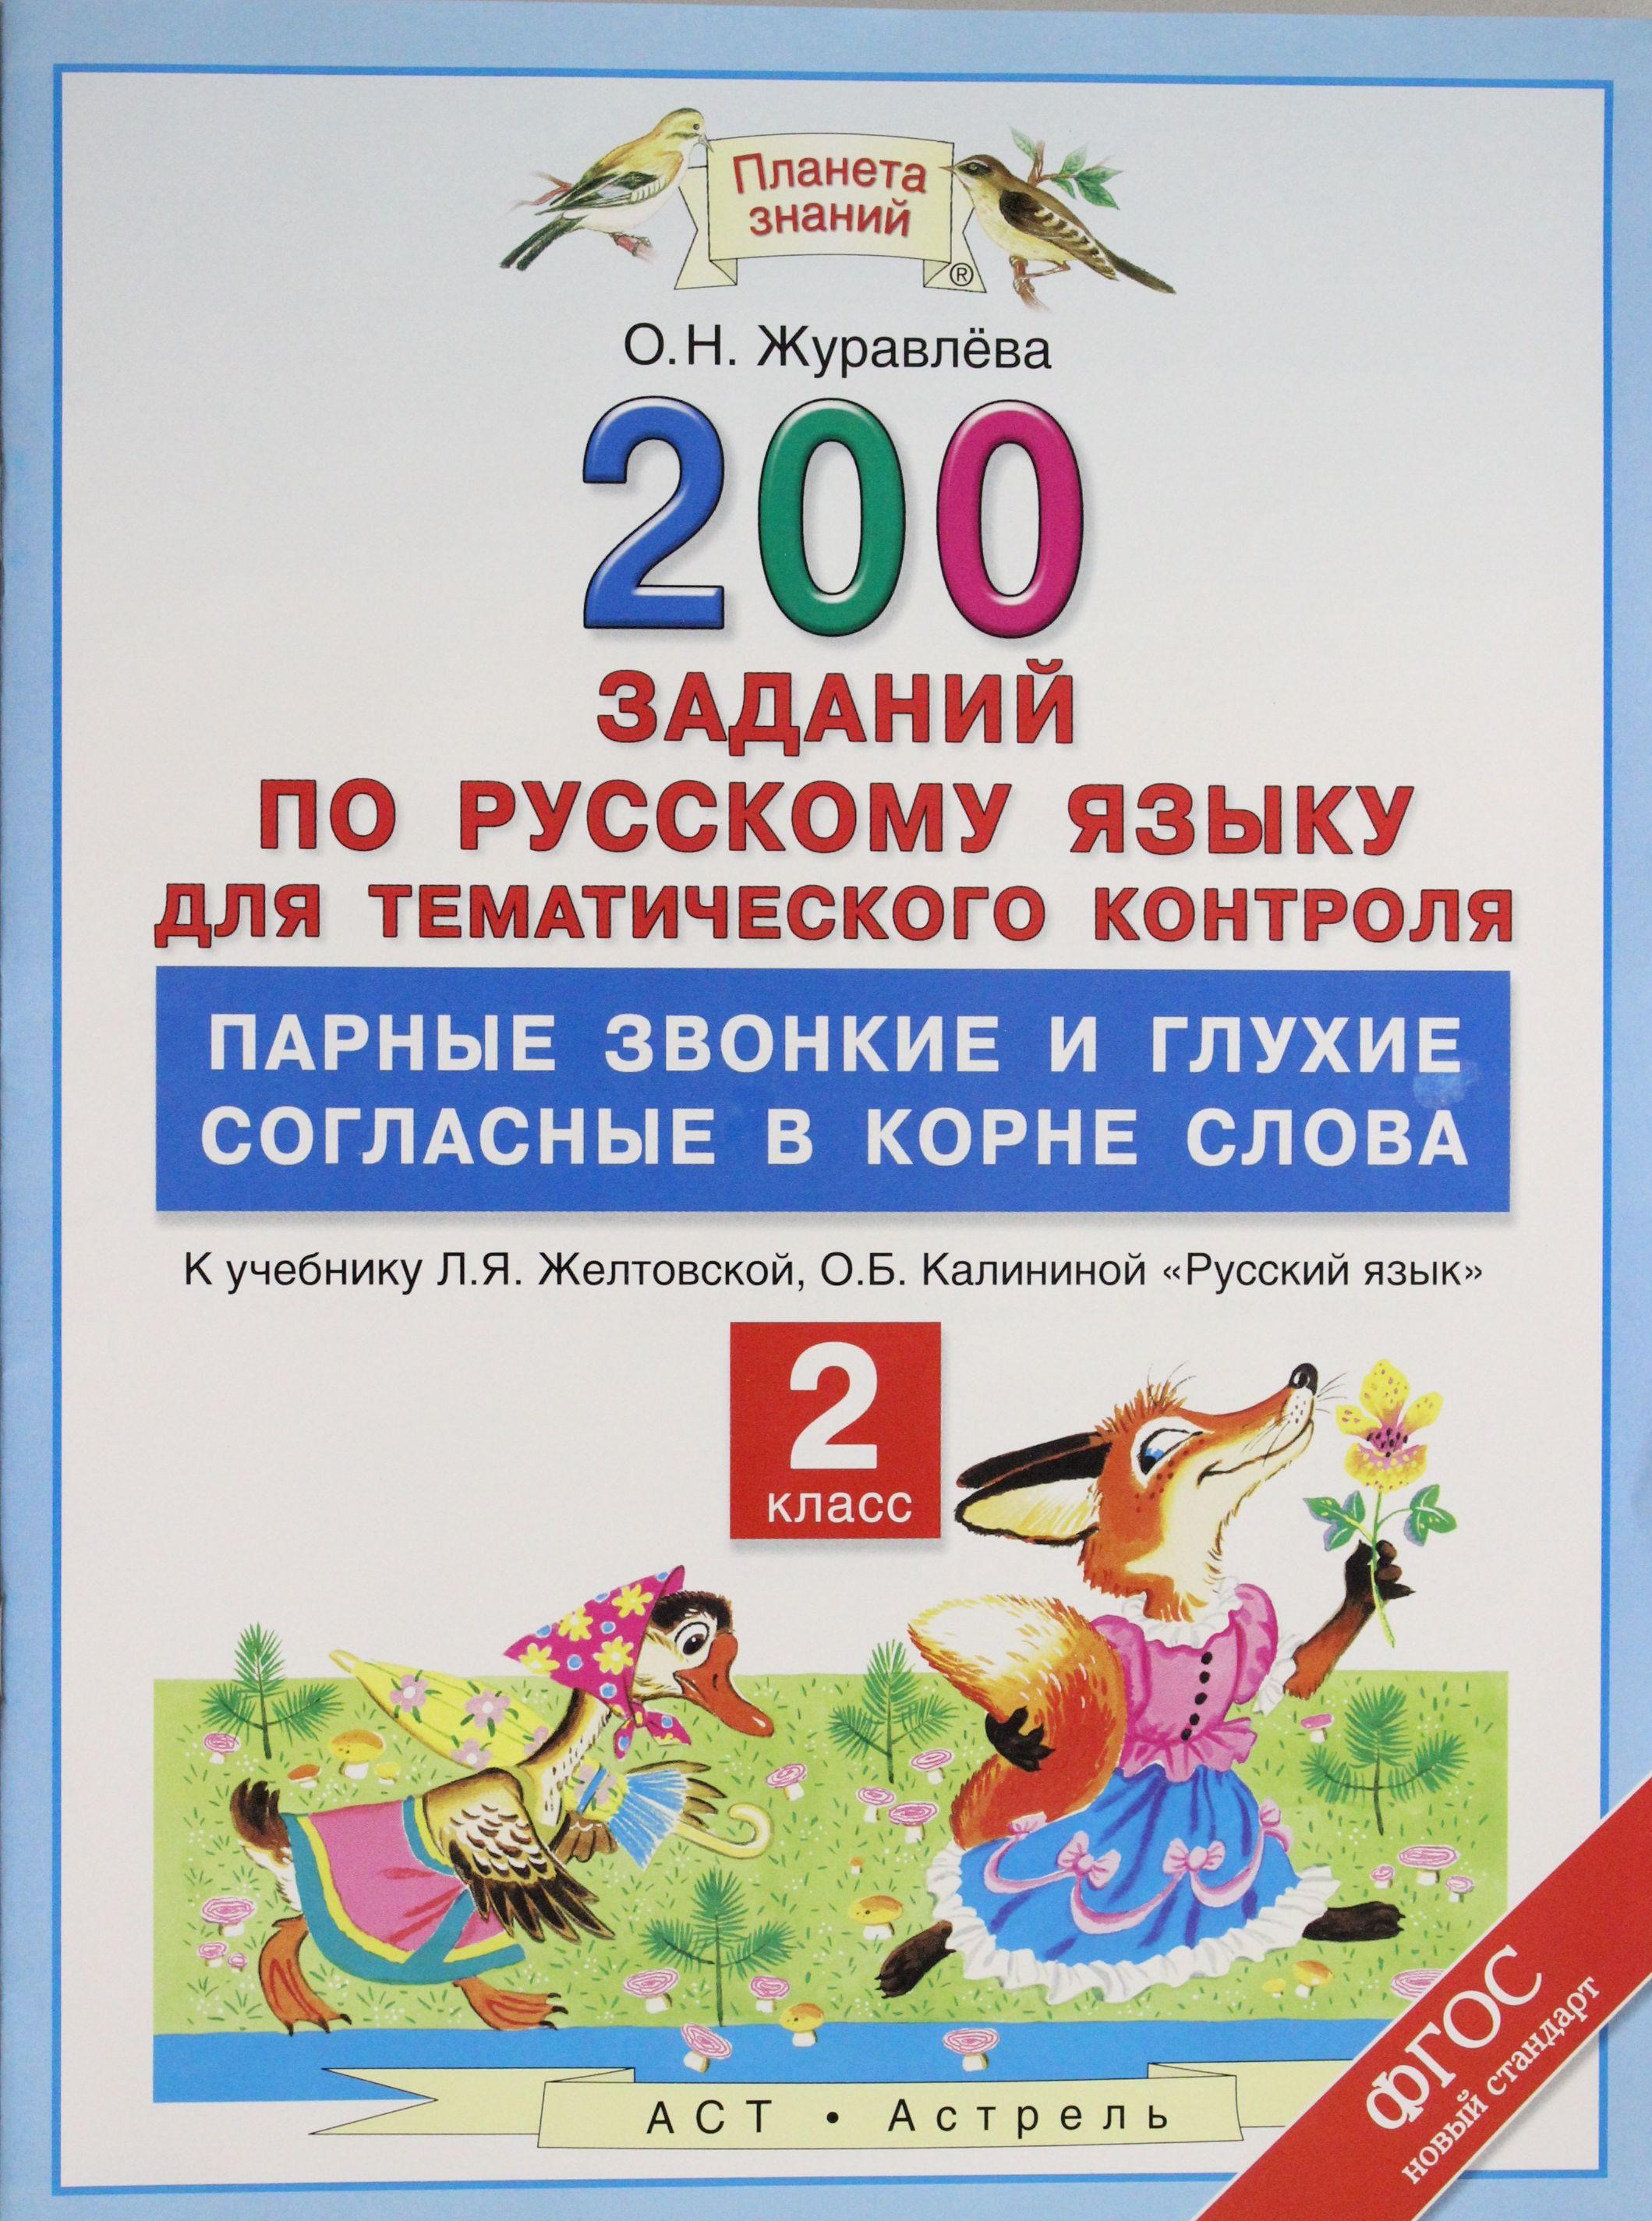 Russkij jazyk. 2 klass. 200 zadanij po russkomu jazyku dlja tematicheskogo kontrolja. Parnye zvonkie i glukhie soglasnye v korne slova